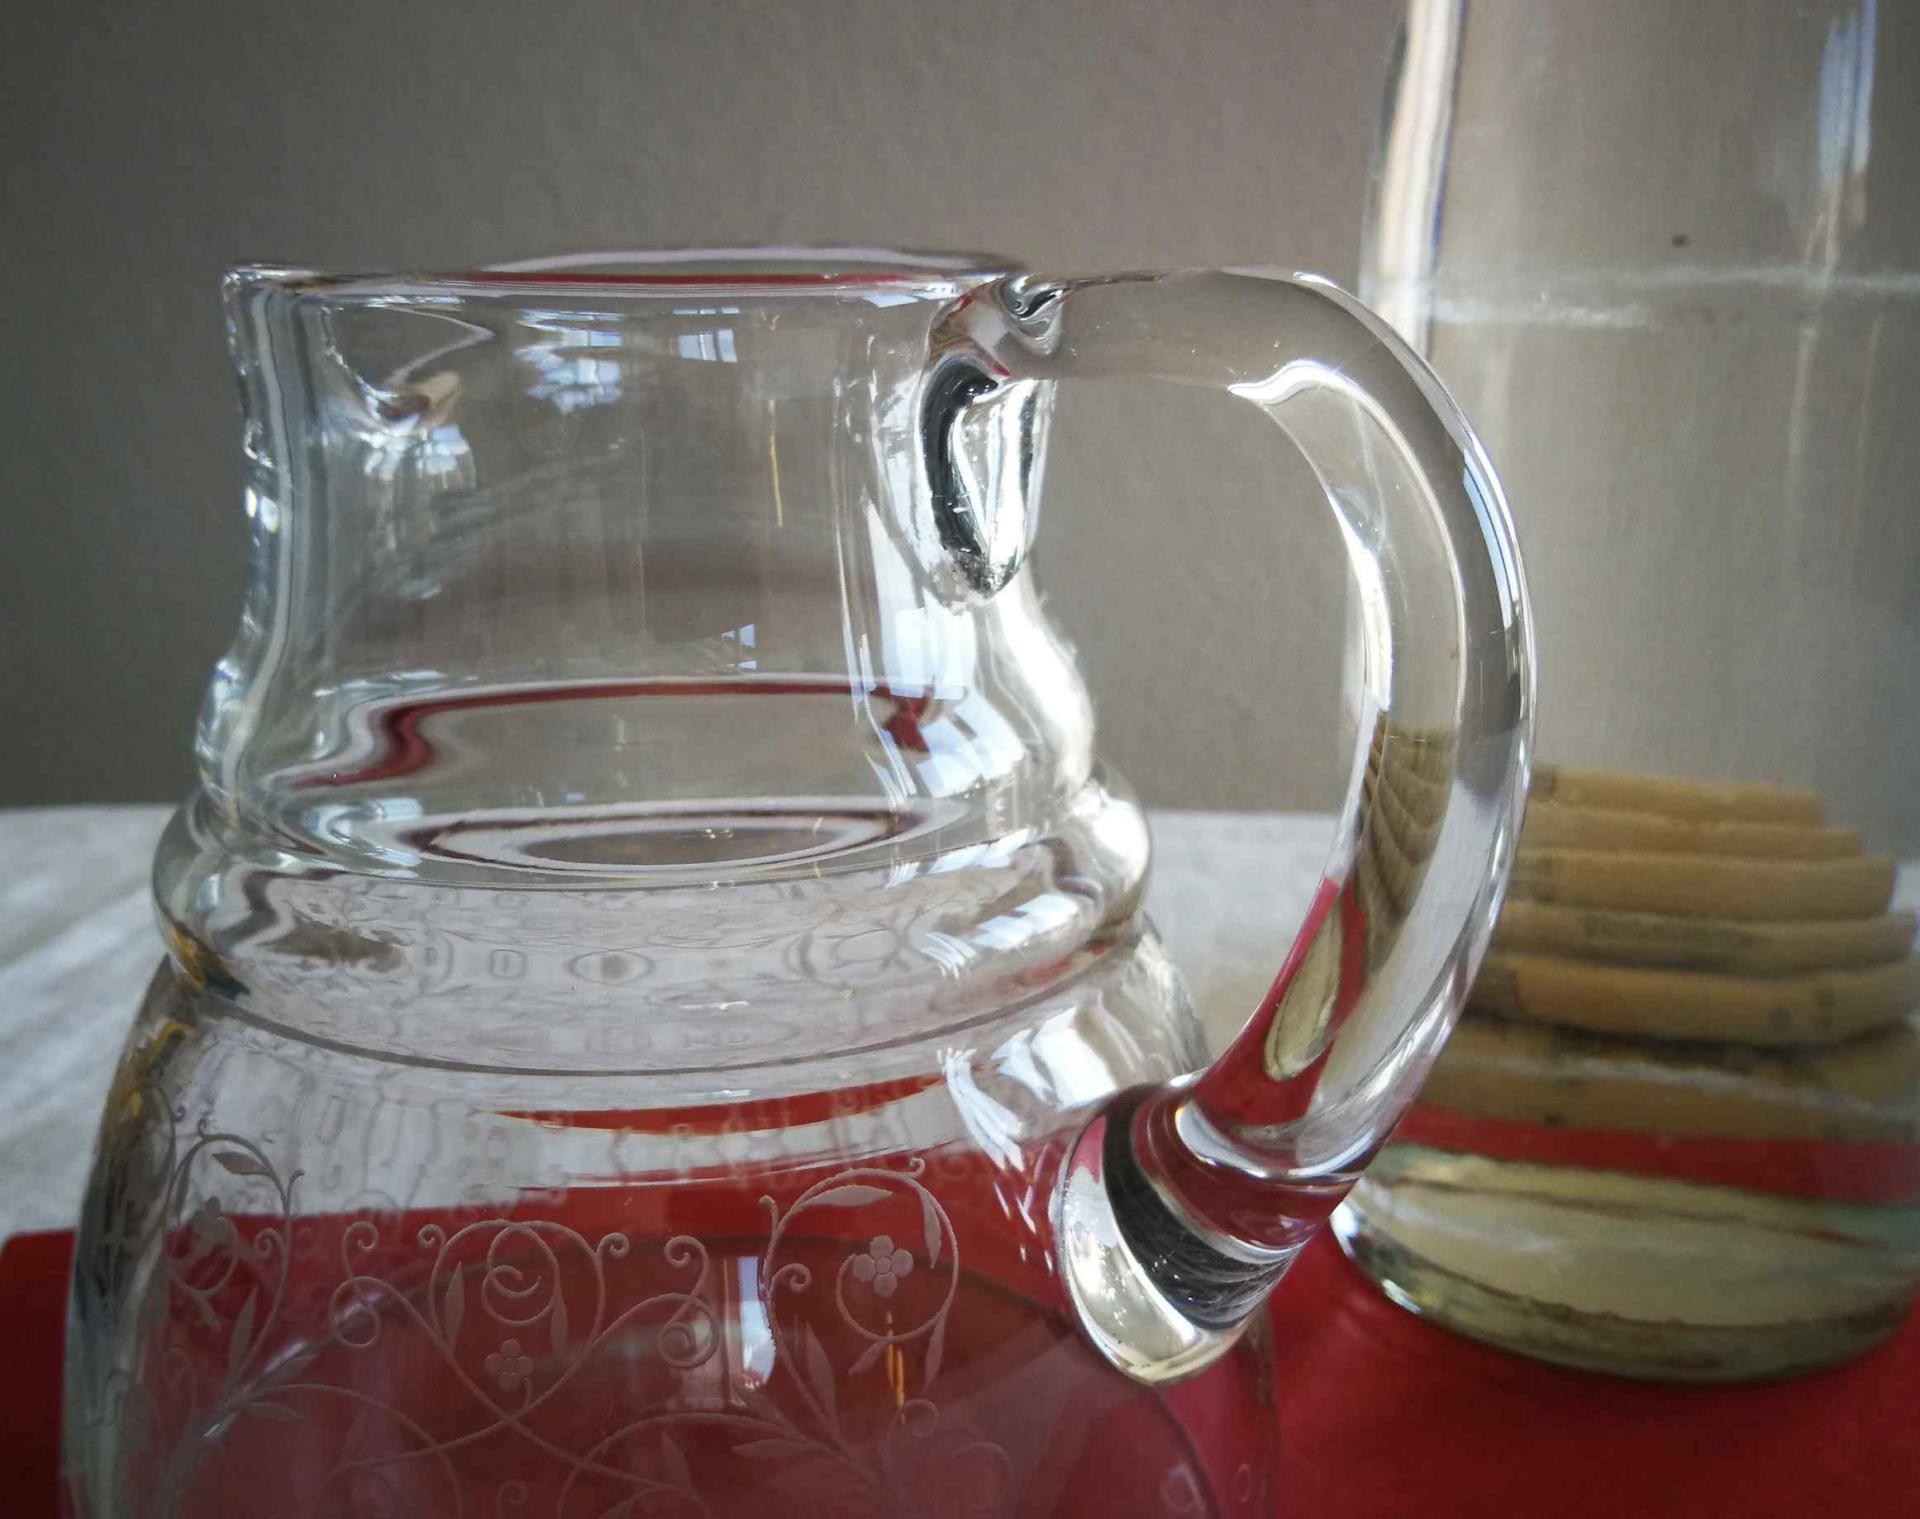 Broc à eau cristal Baccarat, service Lulli